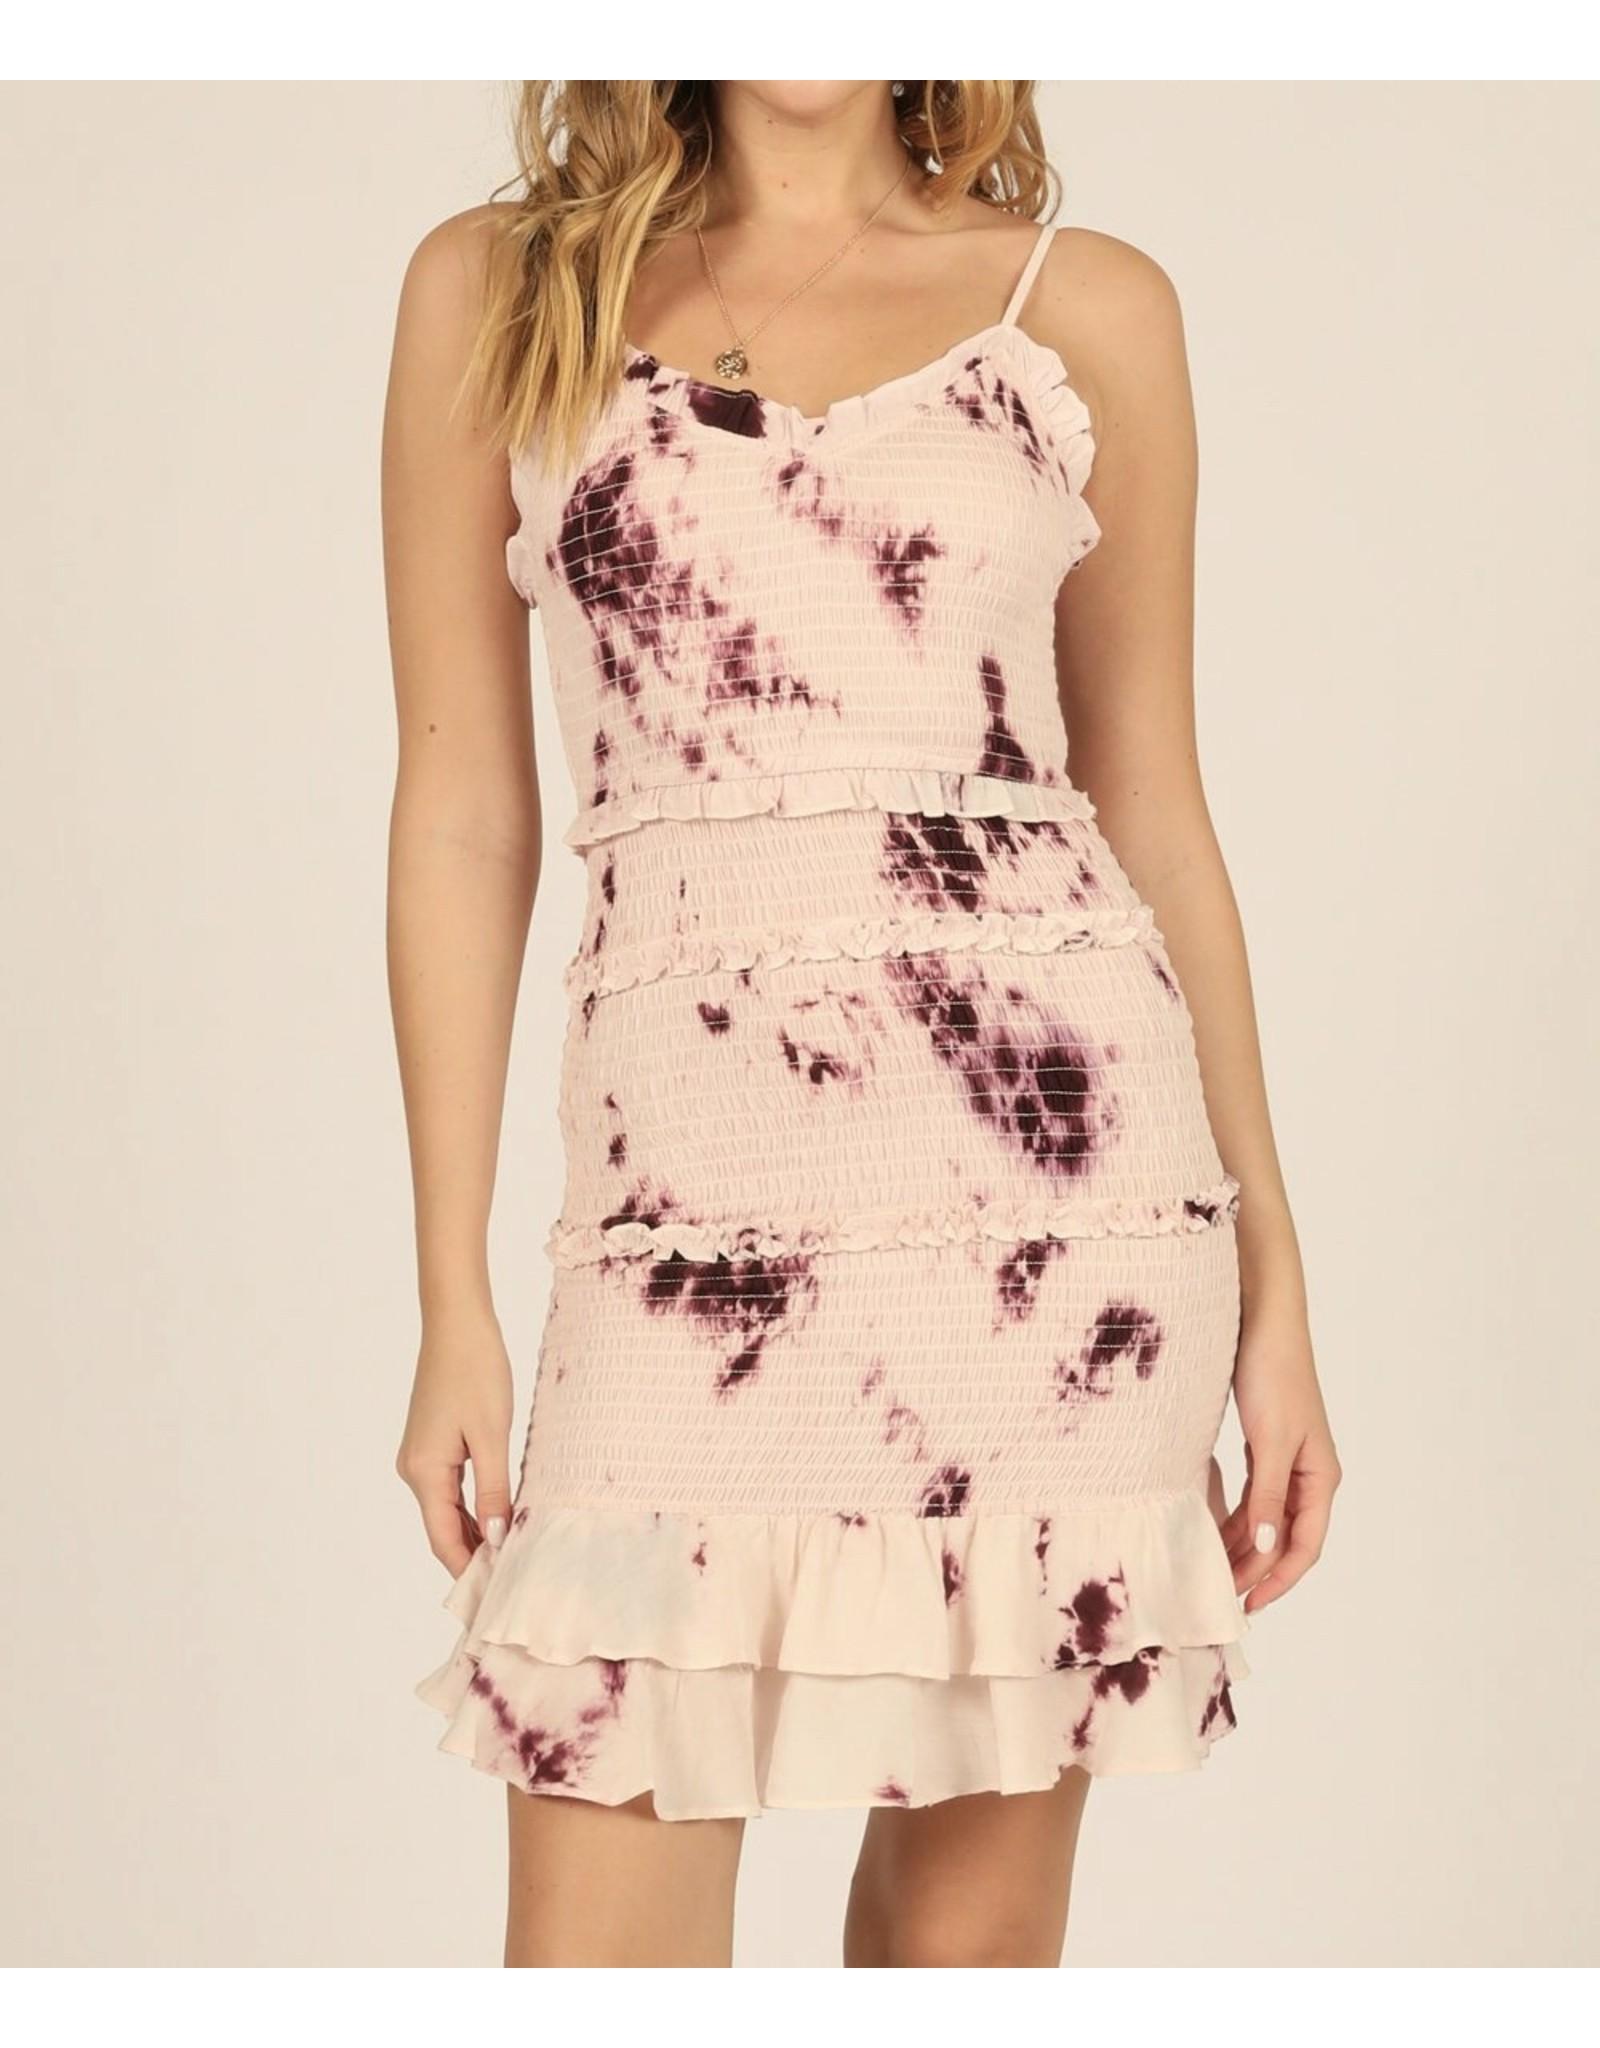 Tie Dye Smocked Dress - Burgundy